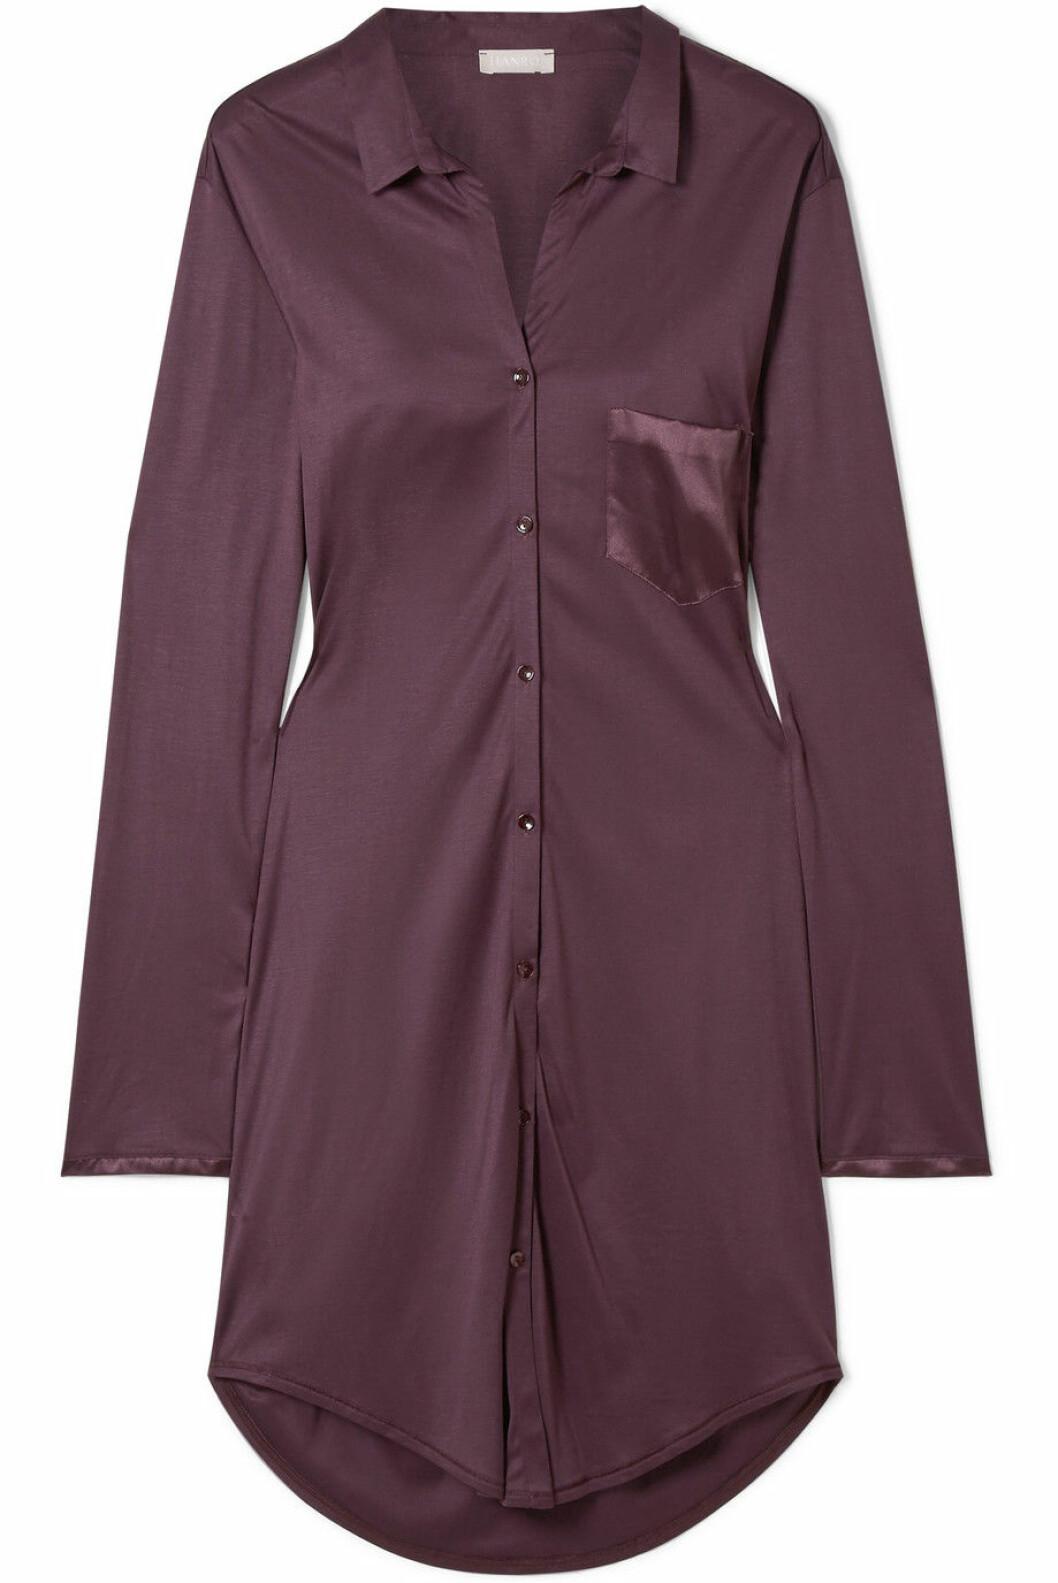 Nattskjorte fra Hanro |1450,-| https://www.net-a-porter.com/no/en/product/1077513/hanro/grand-central-satin-trimmed-modal-and-silk-blend-nightdress